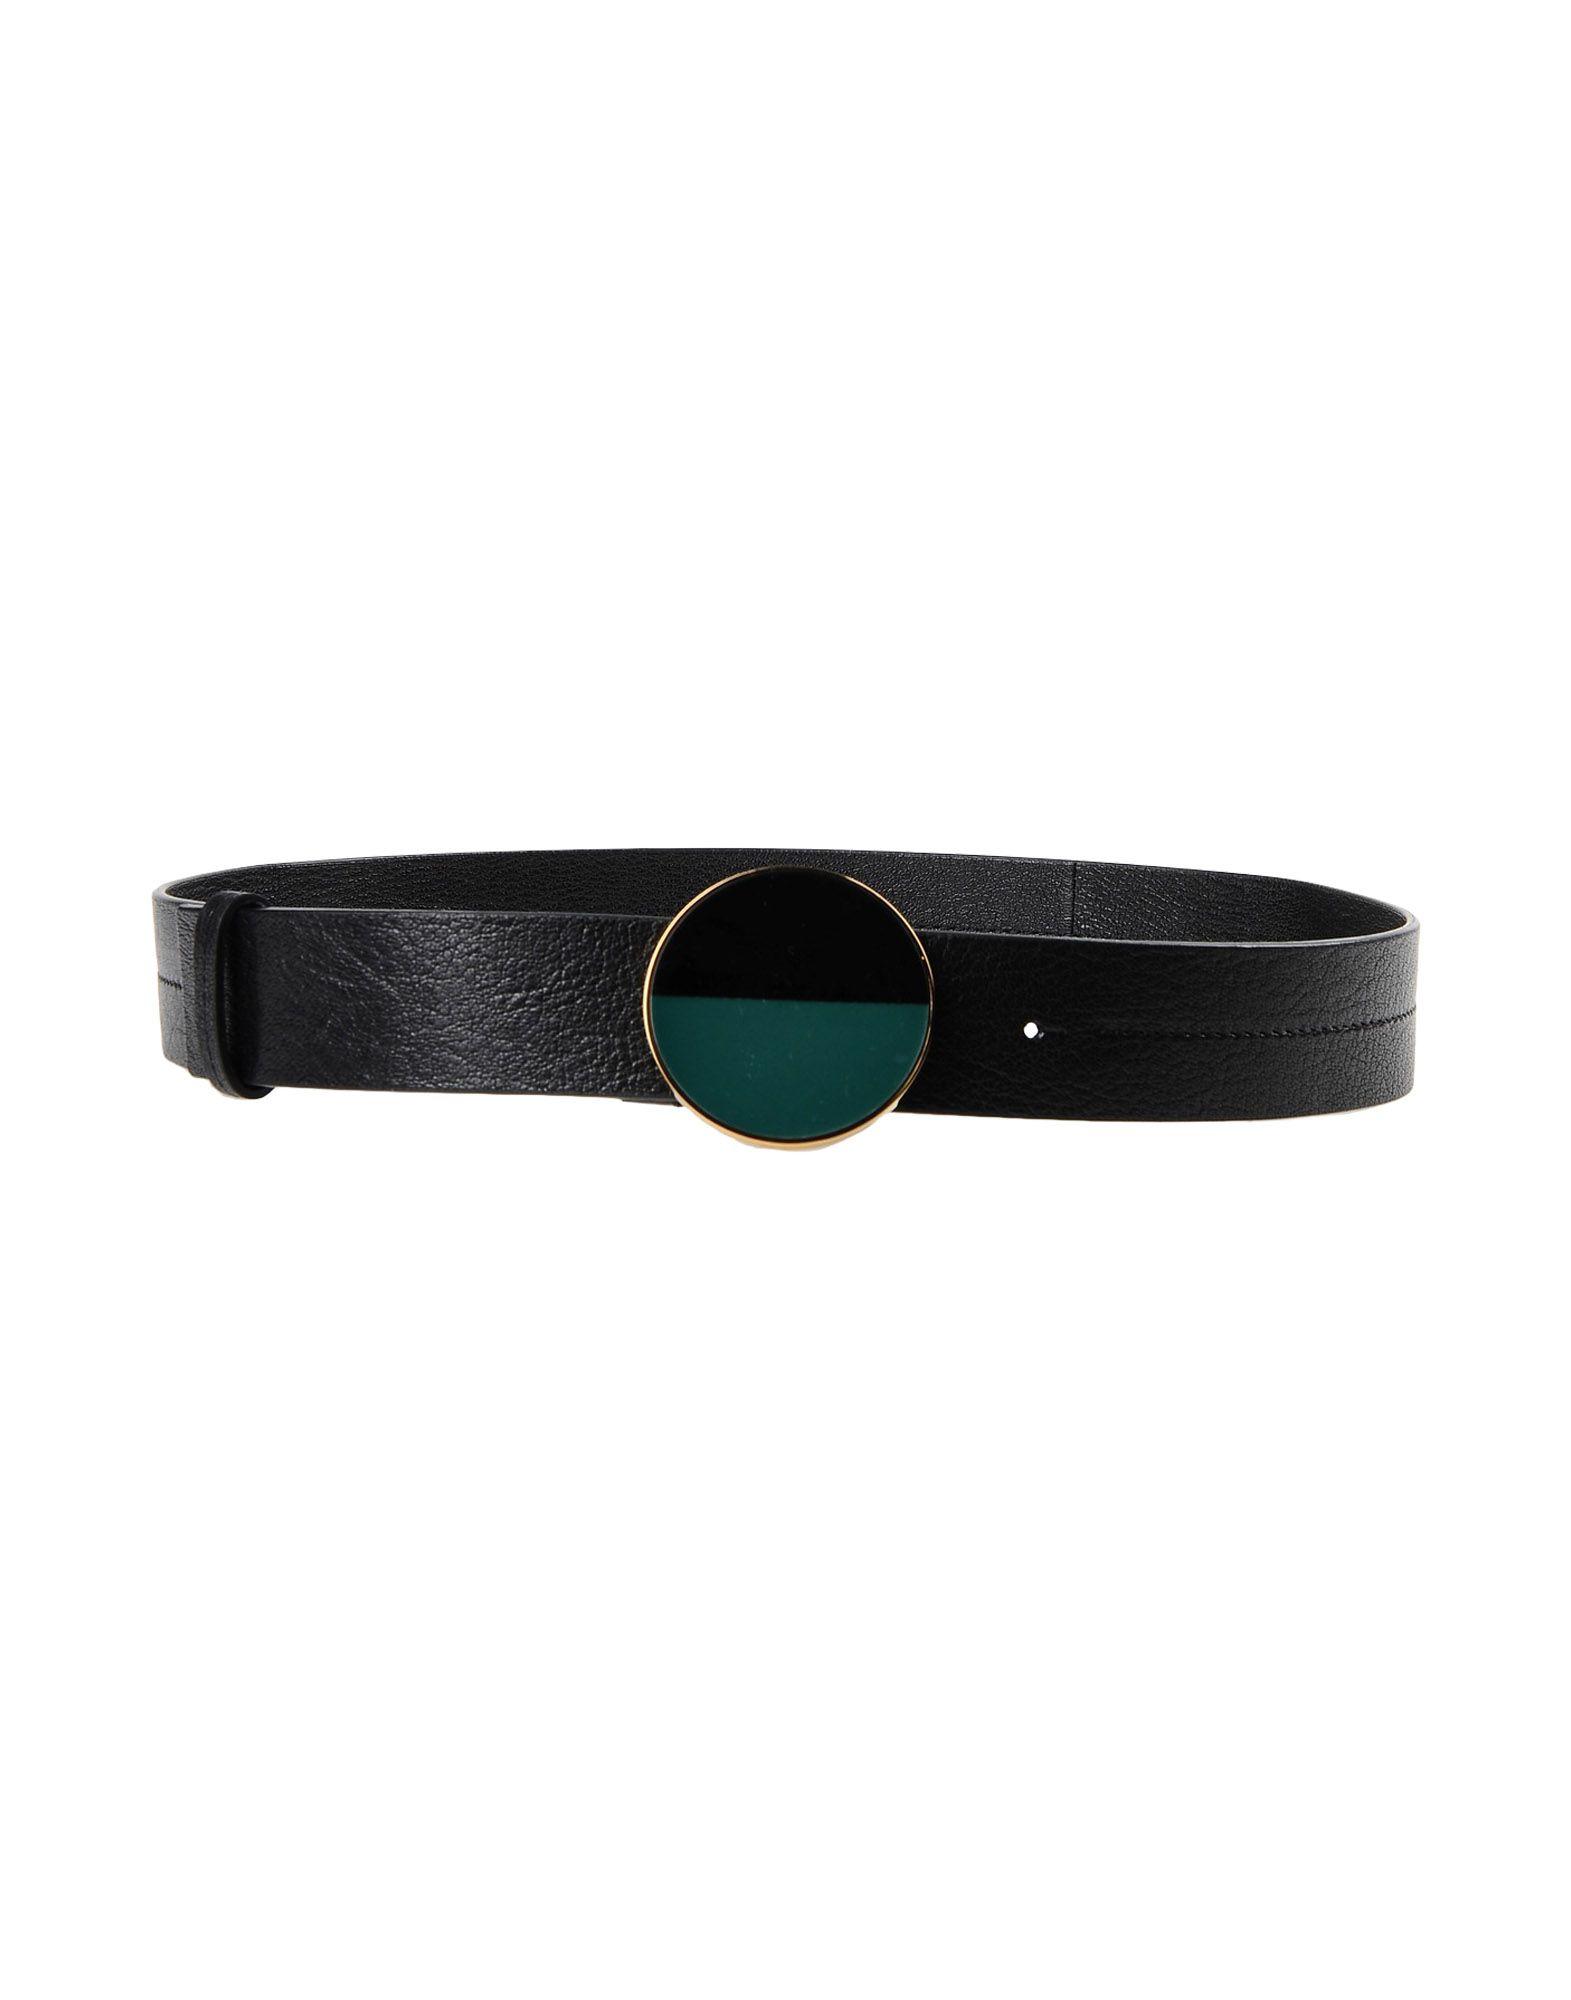 Small Leather Goods - Belts Rada 0TuHf2